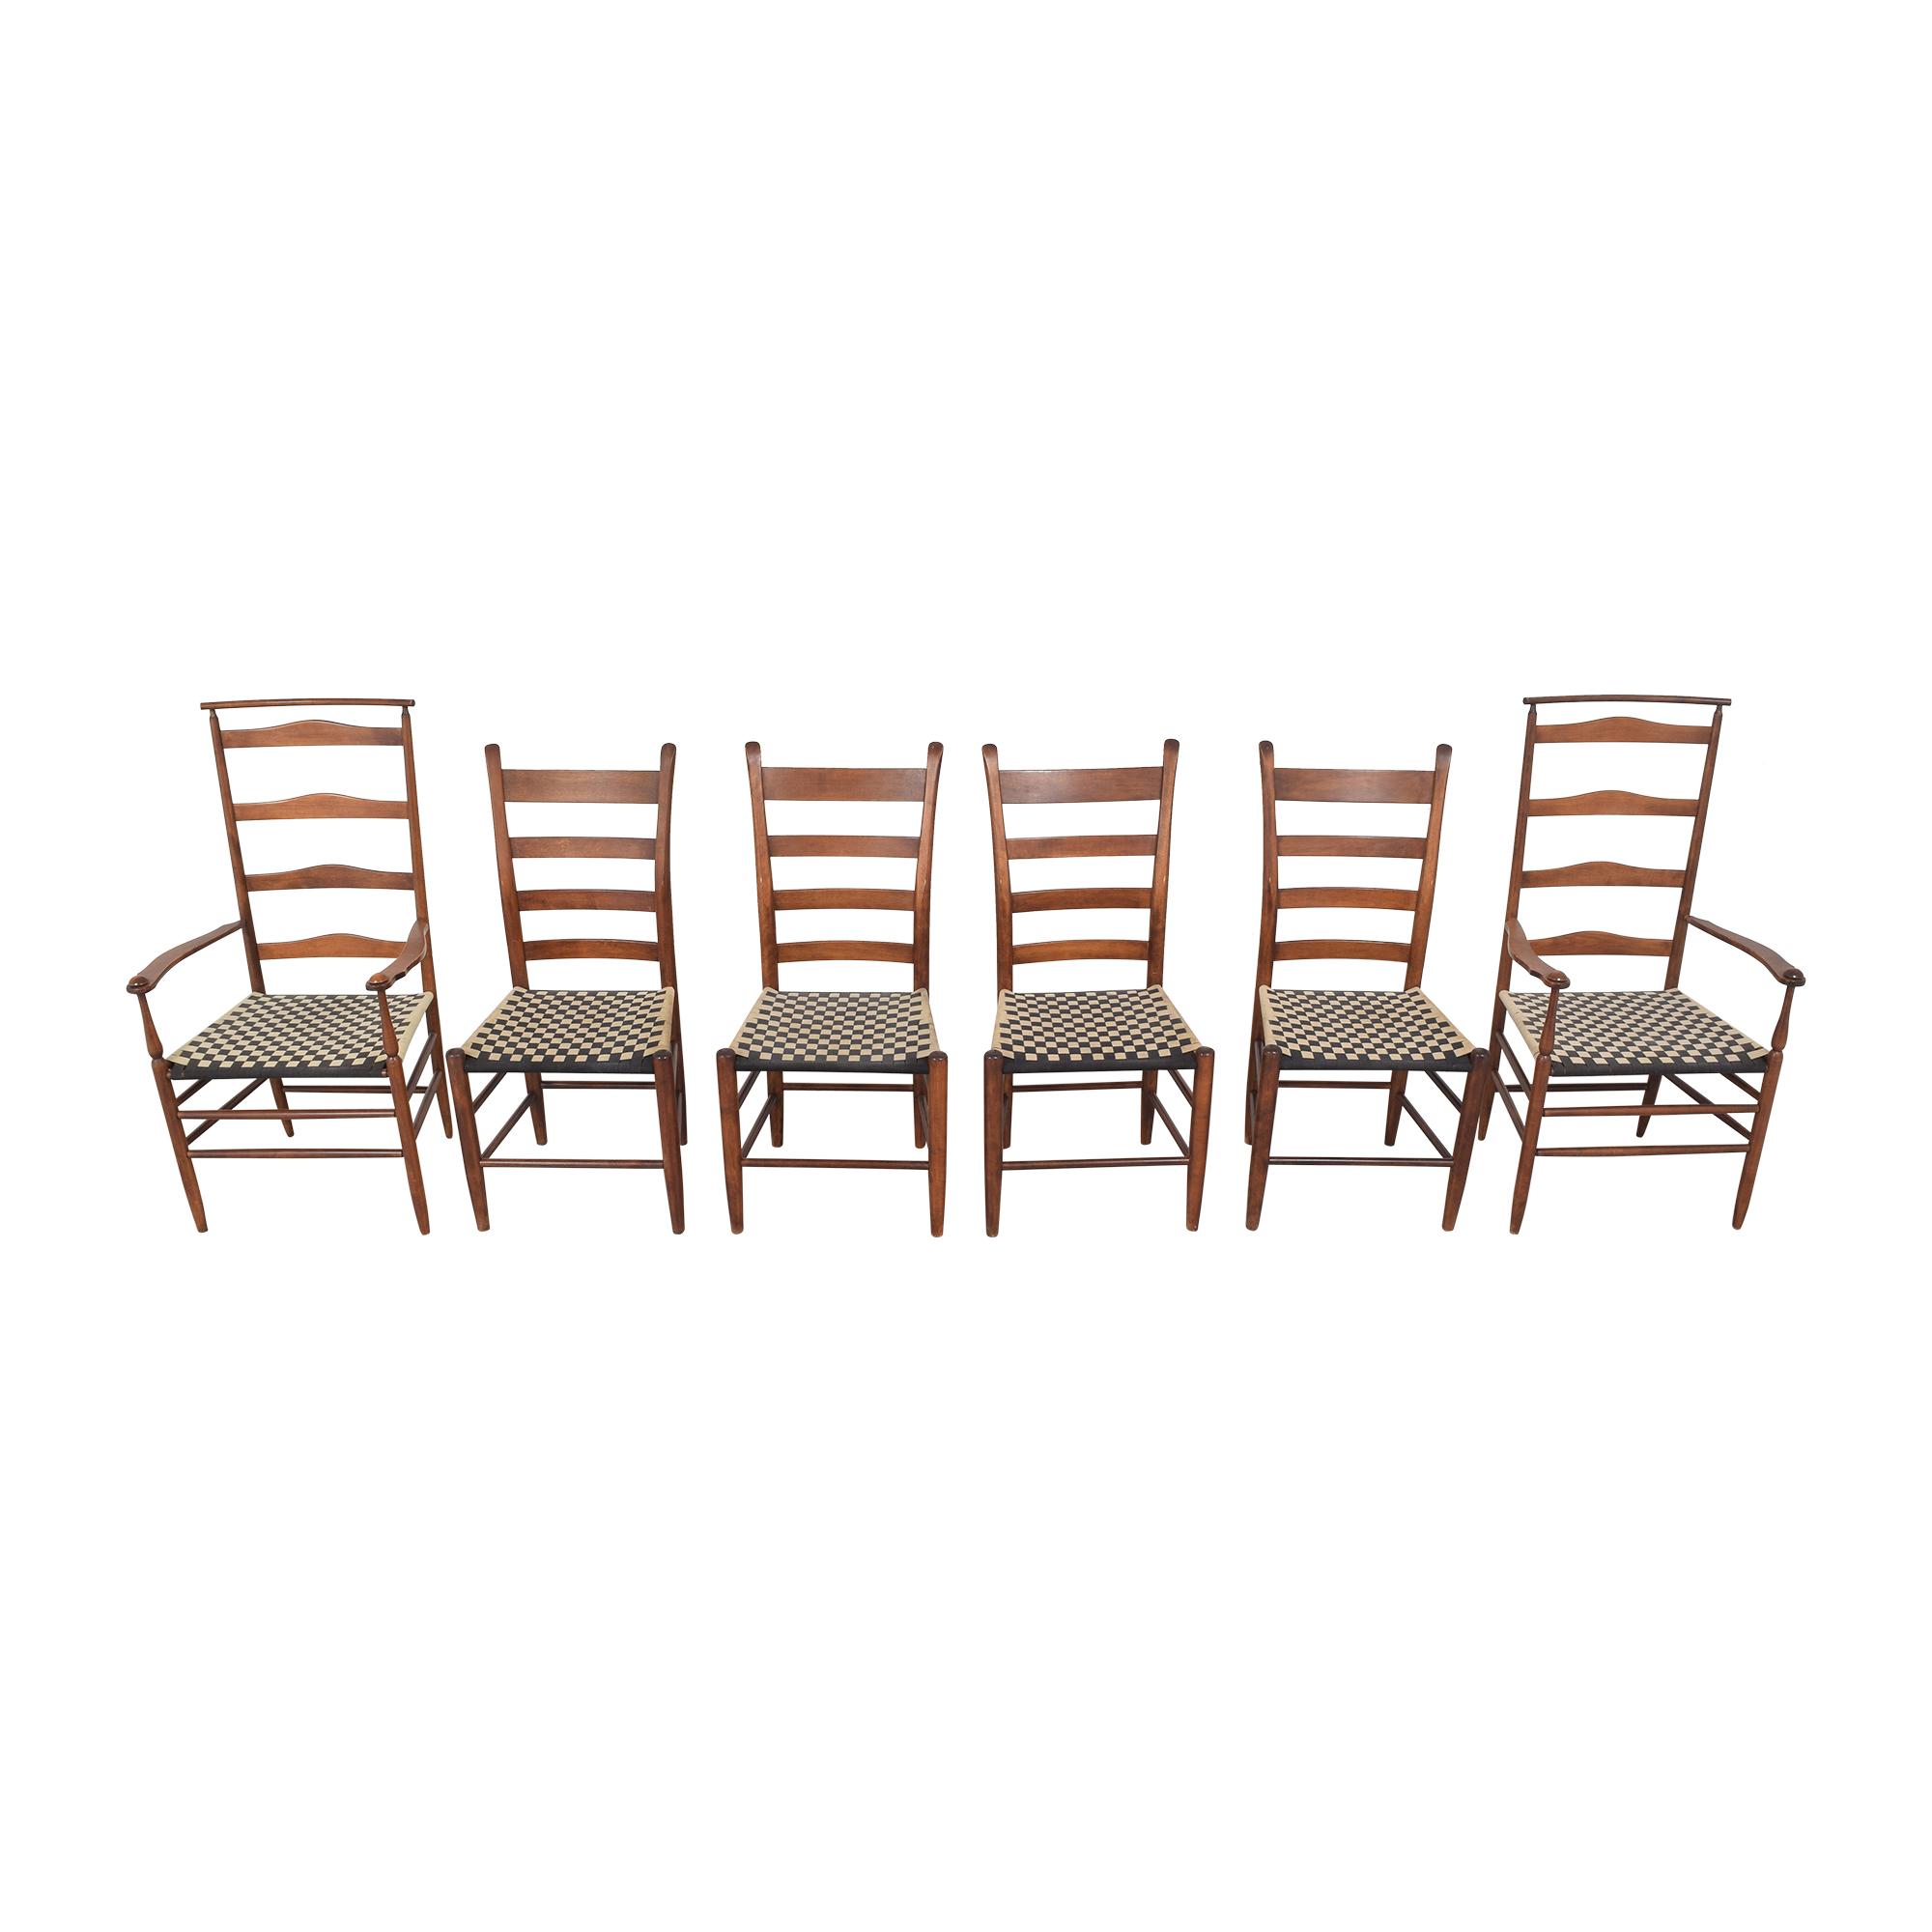 shop Nichols & Stone Nichols & Stone Ladder Back Dining Chairs online